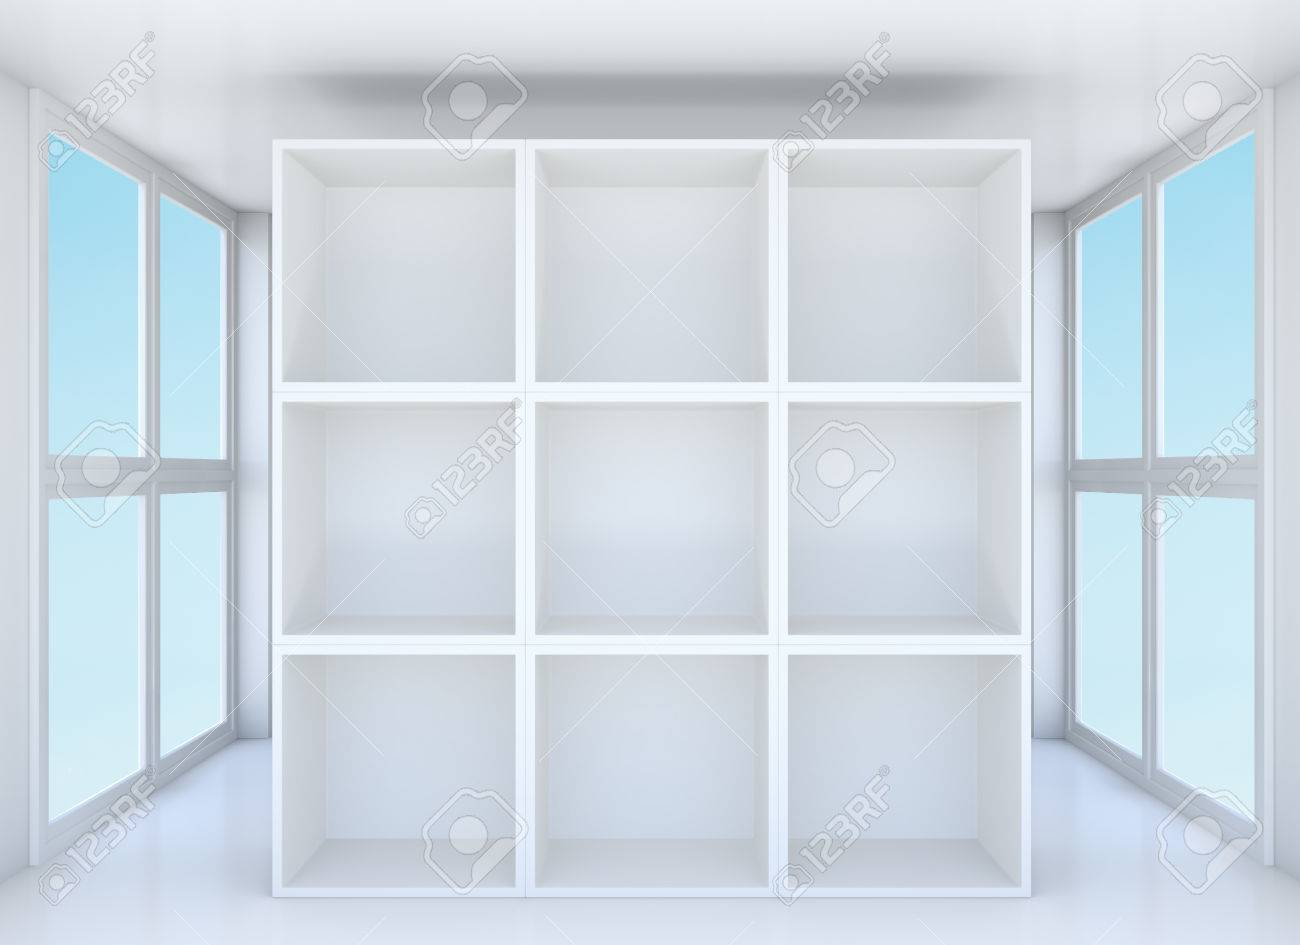 Empty Showcase Or Bookshelf In Clean Room. Blue Sky Outside Window. 3D  Illustration Stock